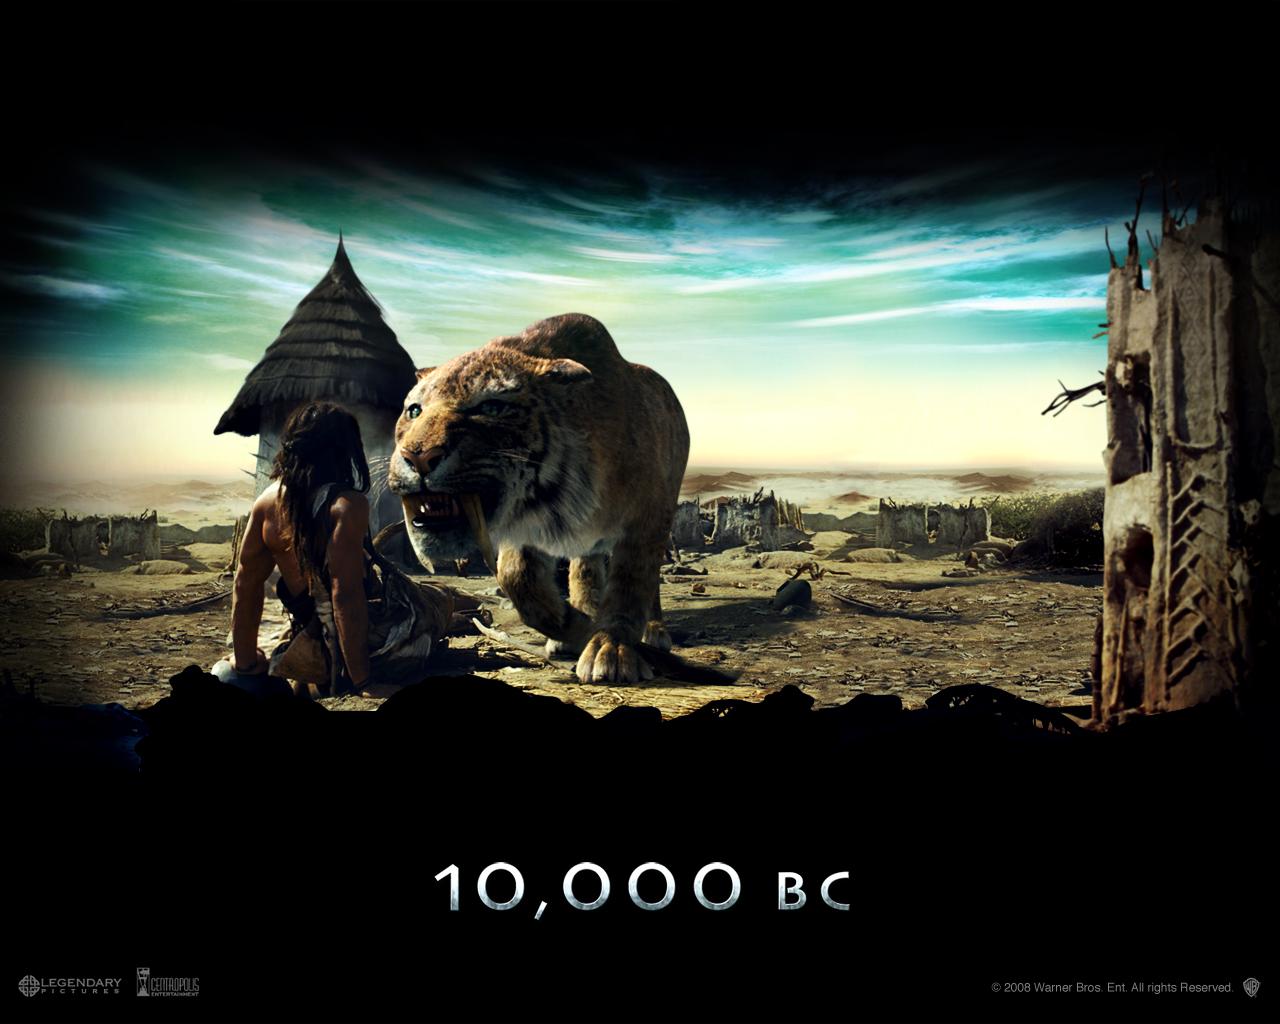 M.Ö. 10.000 Filmi Afişleri